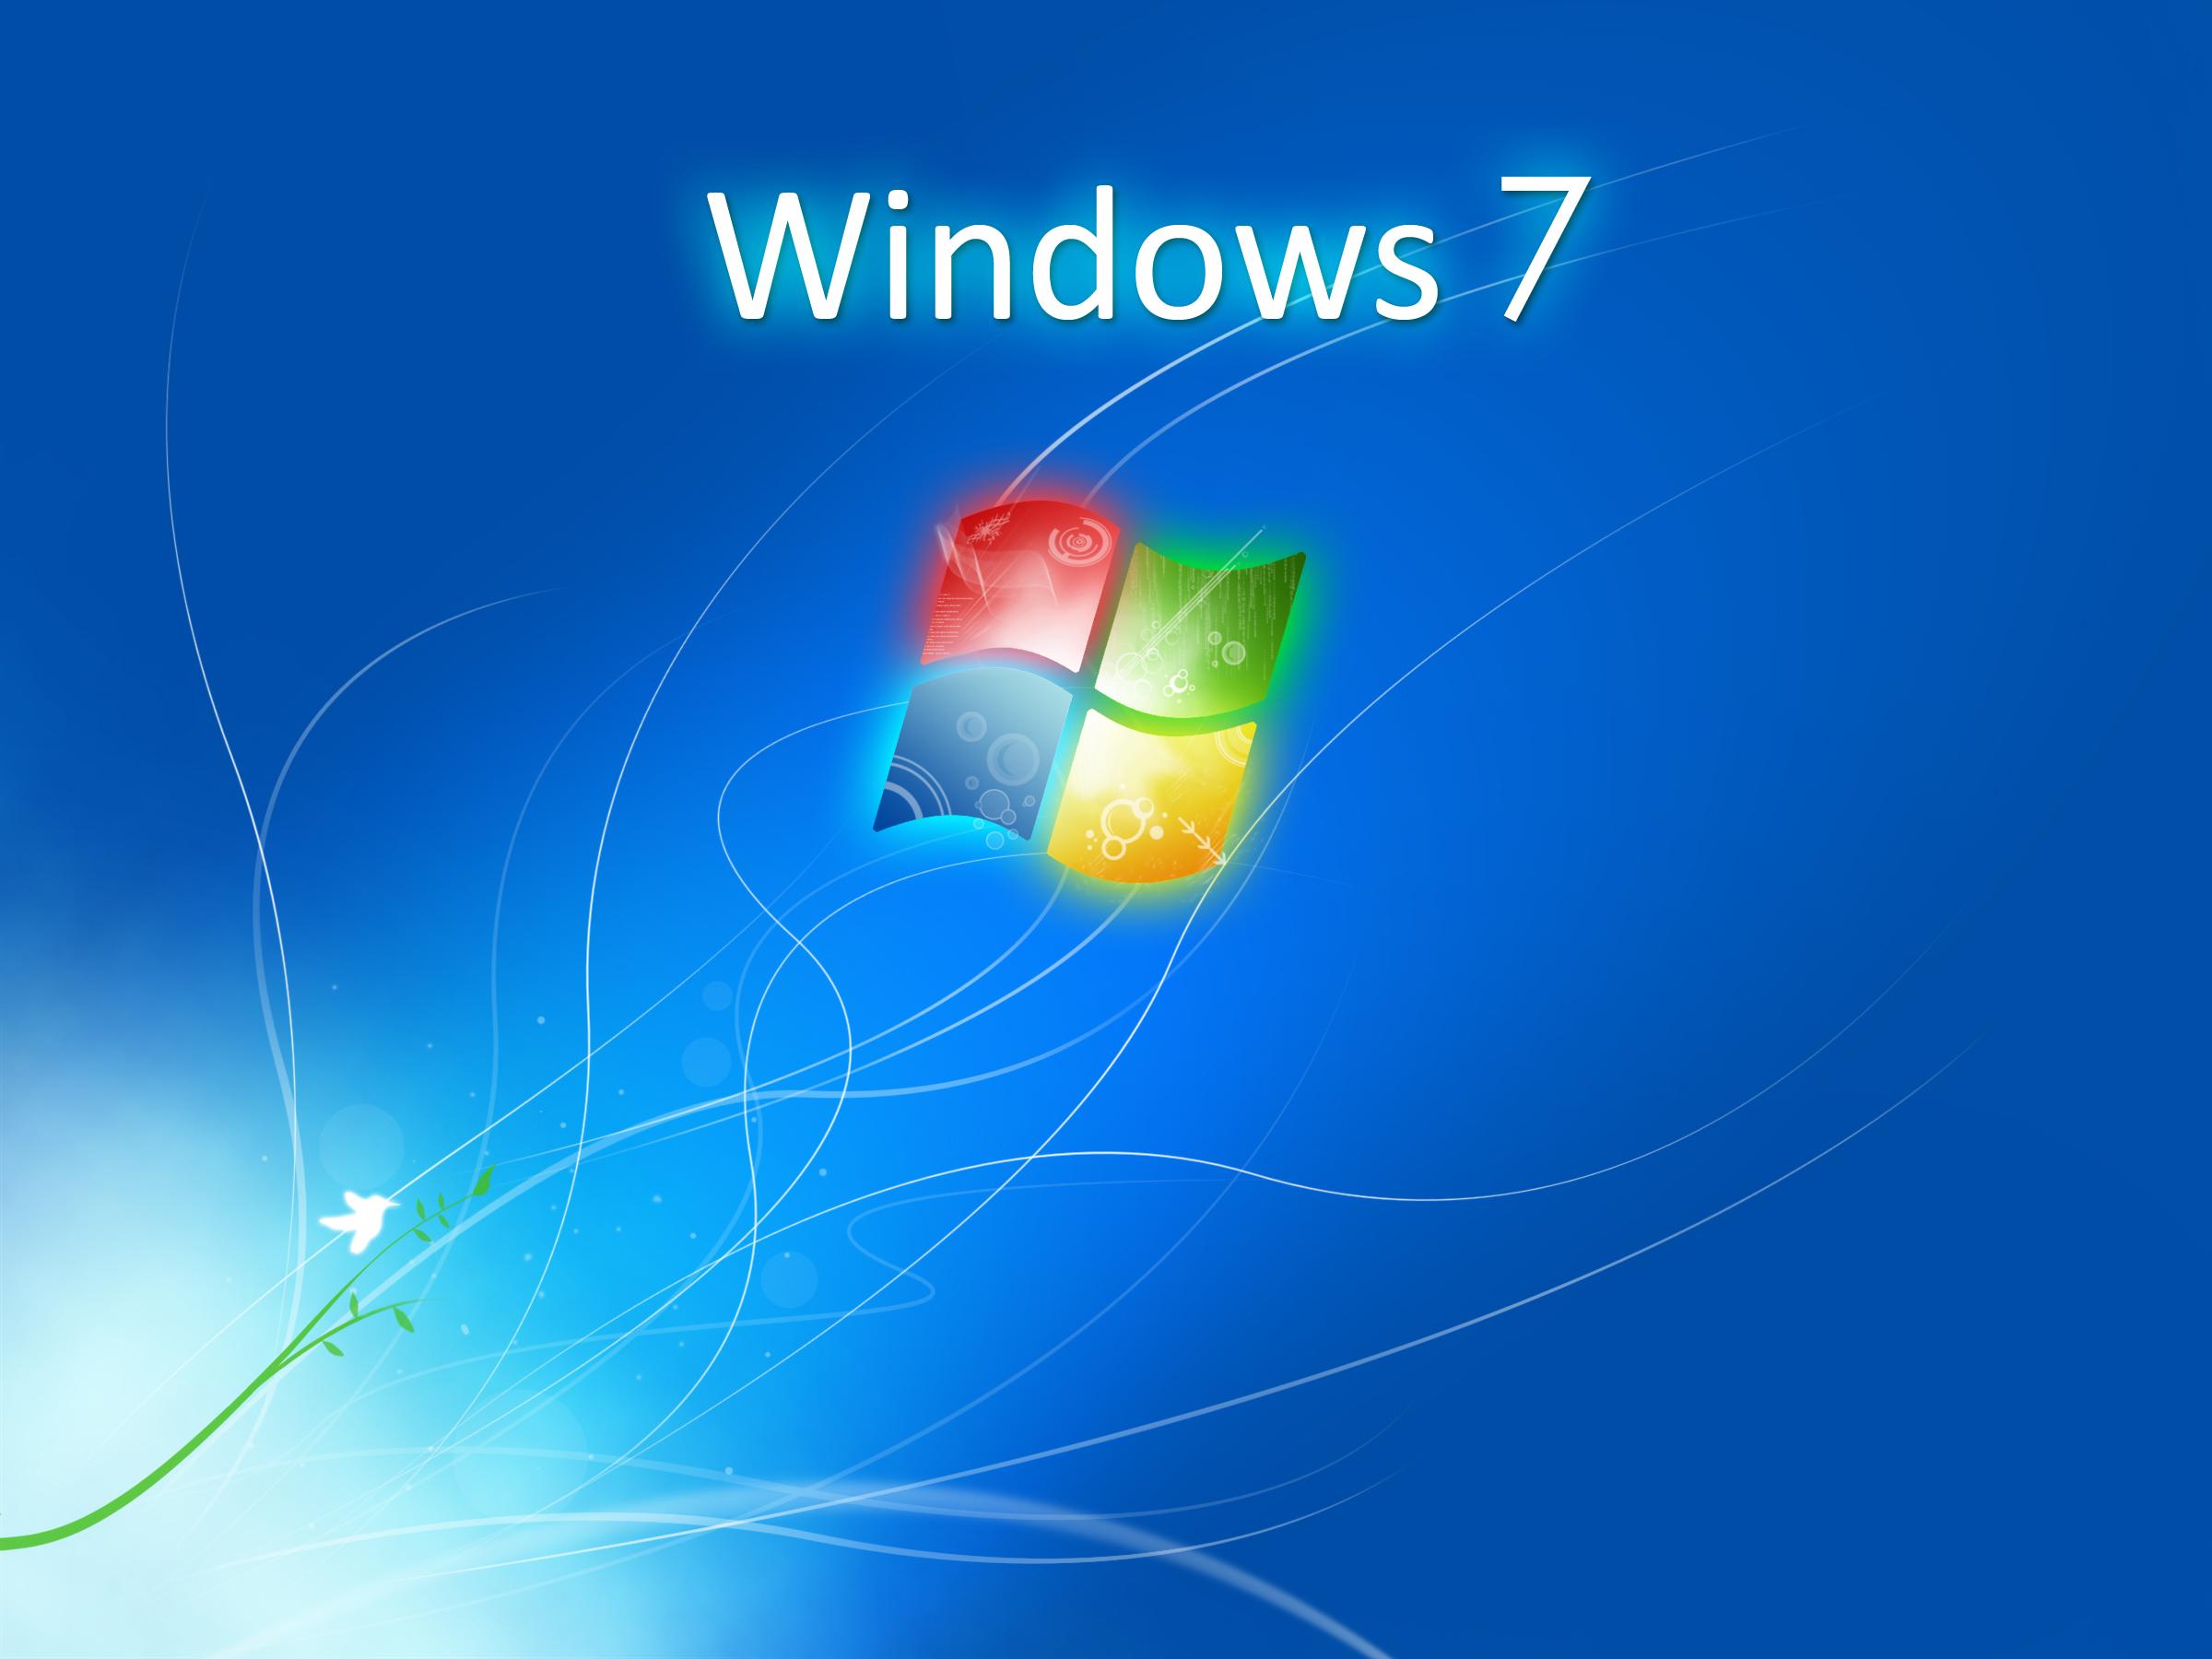 Windows7の壁紙まとめ